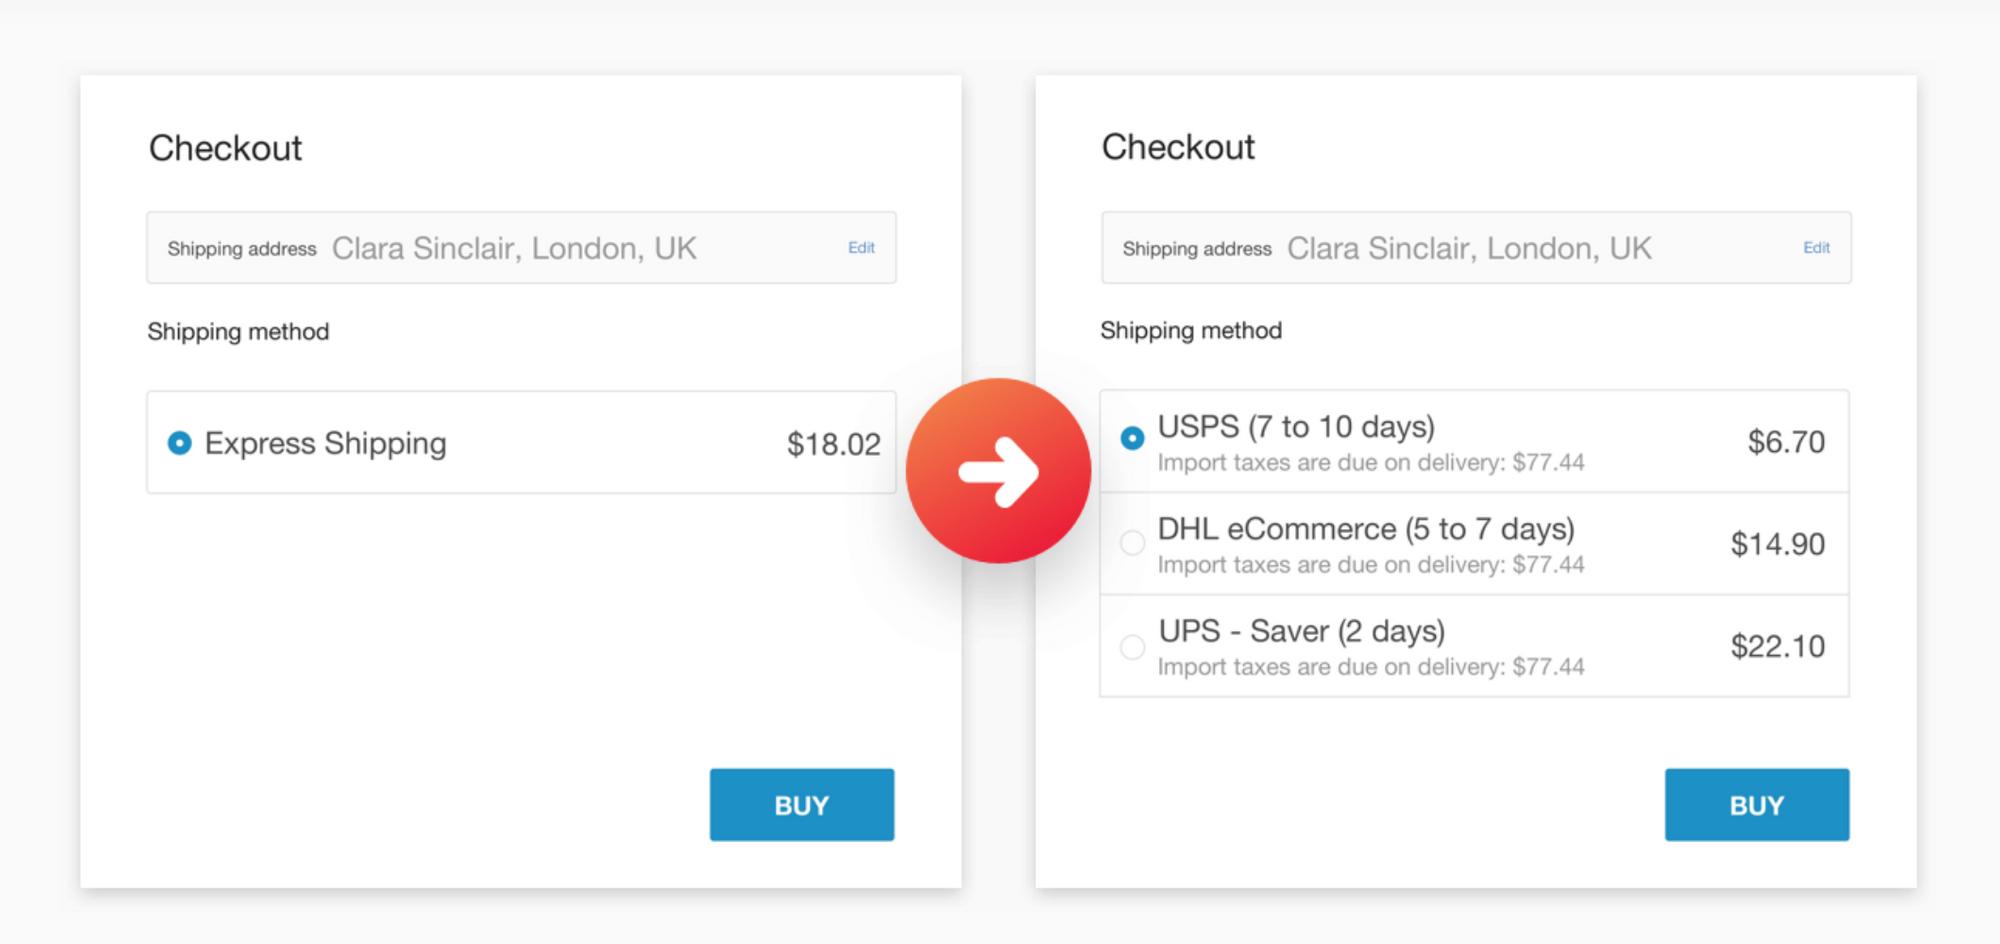 Live Shipping Rates at Checkout